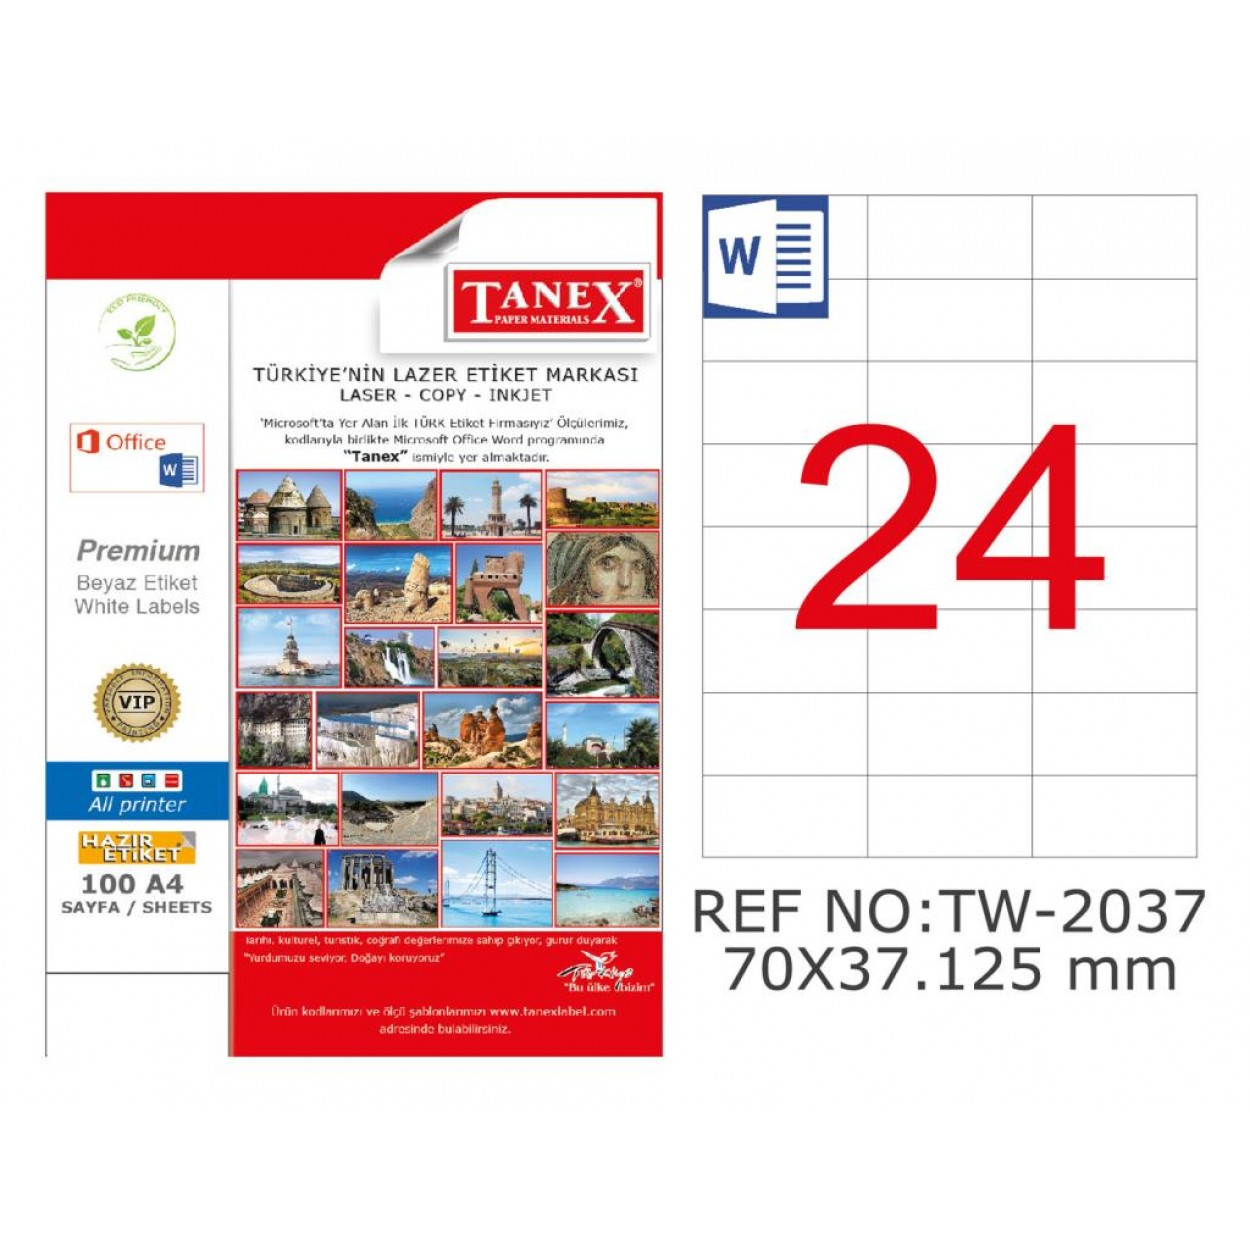 Tanex TW-2037 70x37.125mm Şeffaf Laser Etiket 600 Lü